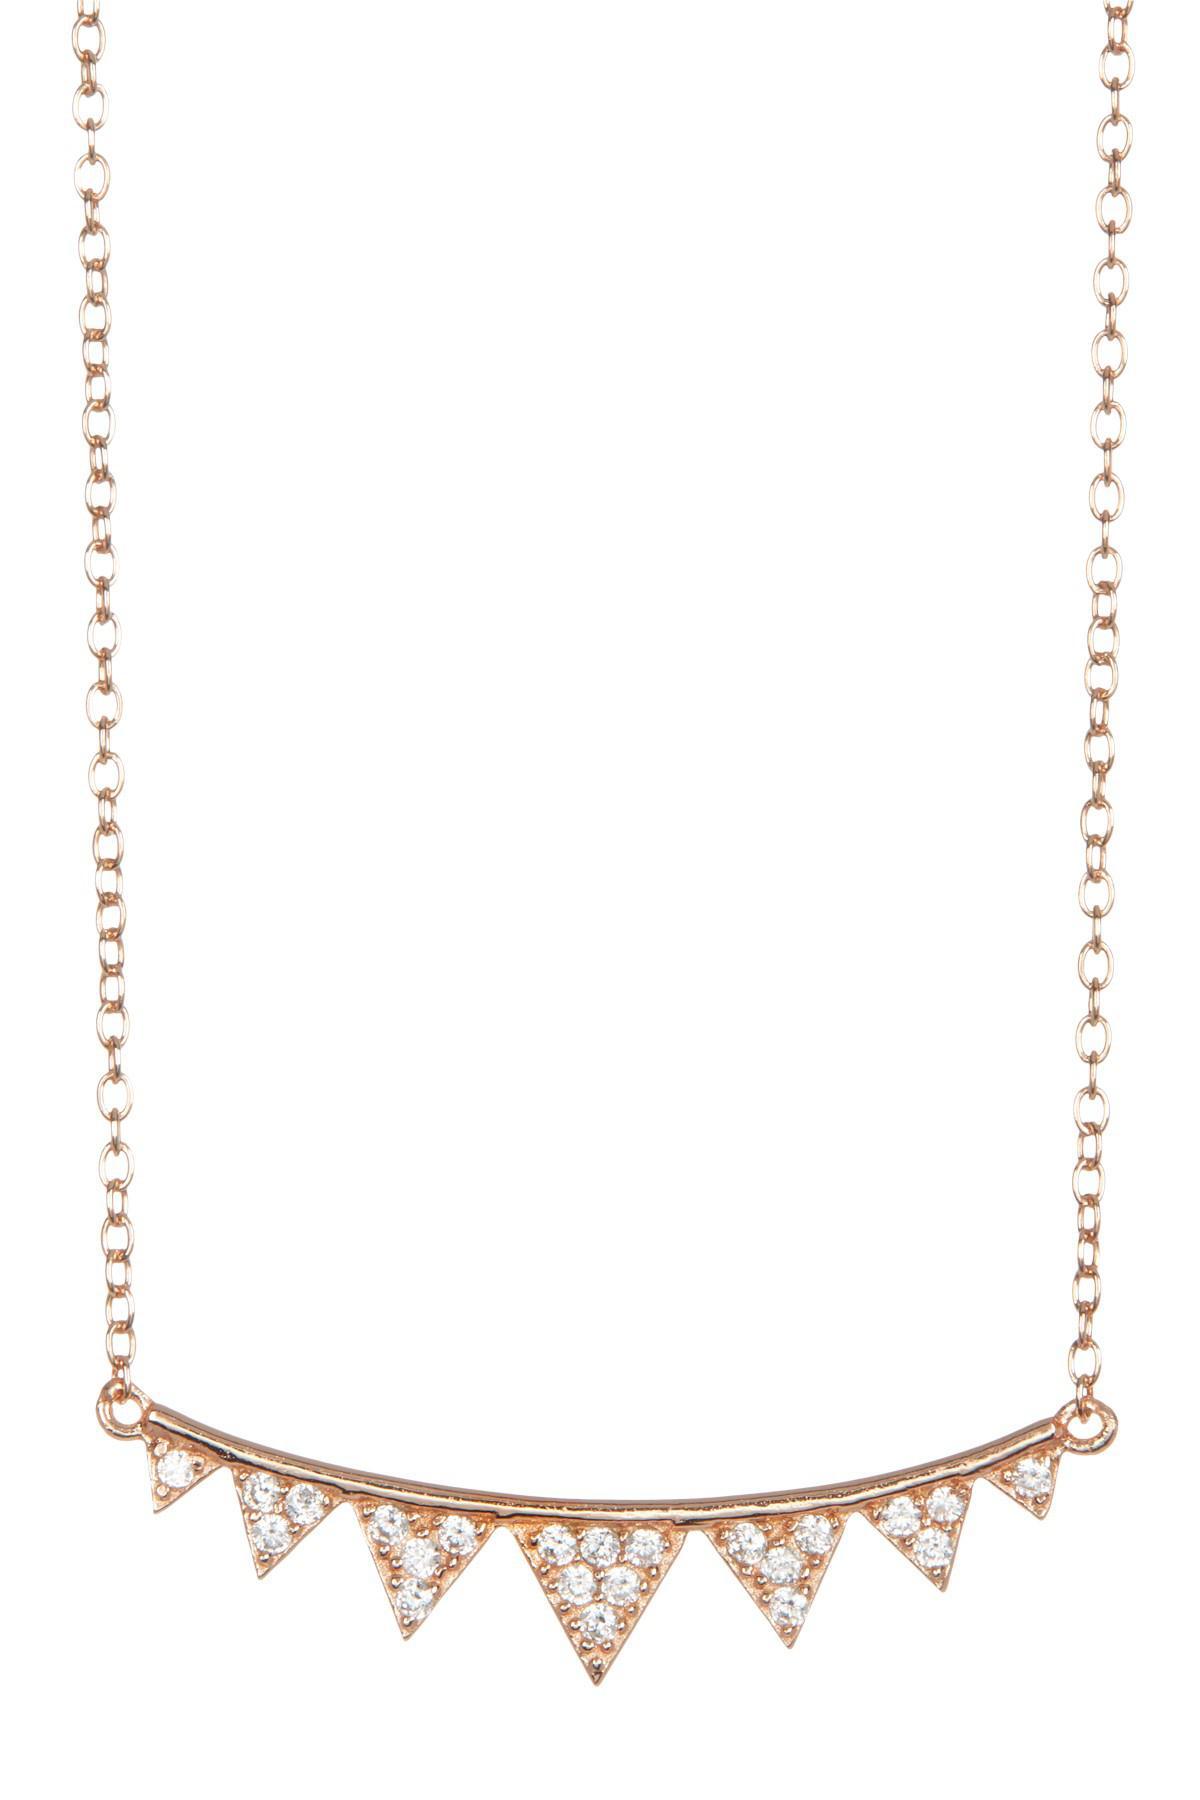 Rose Necklace in Metallic Gold Shashi xffpElSs